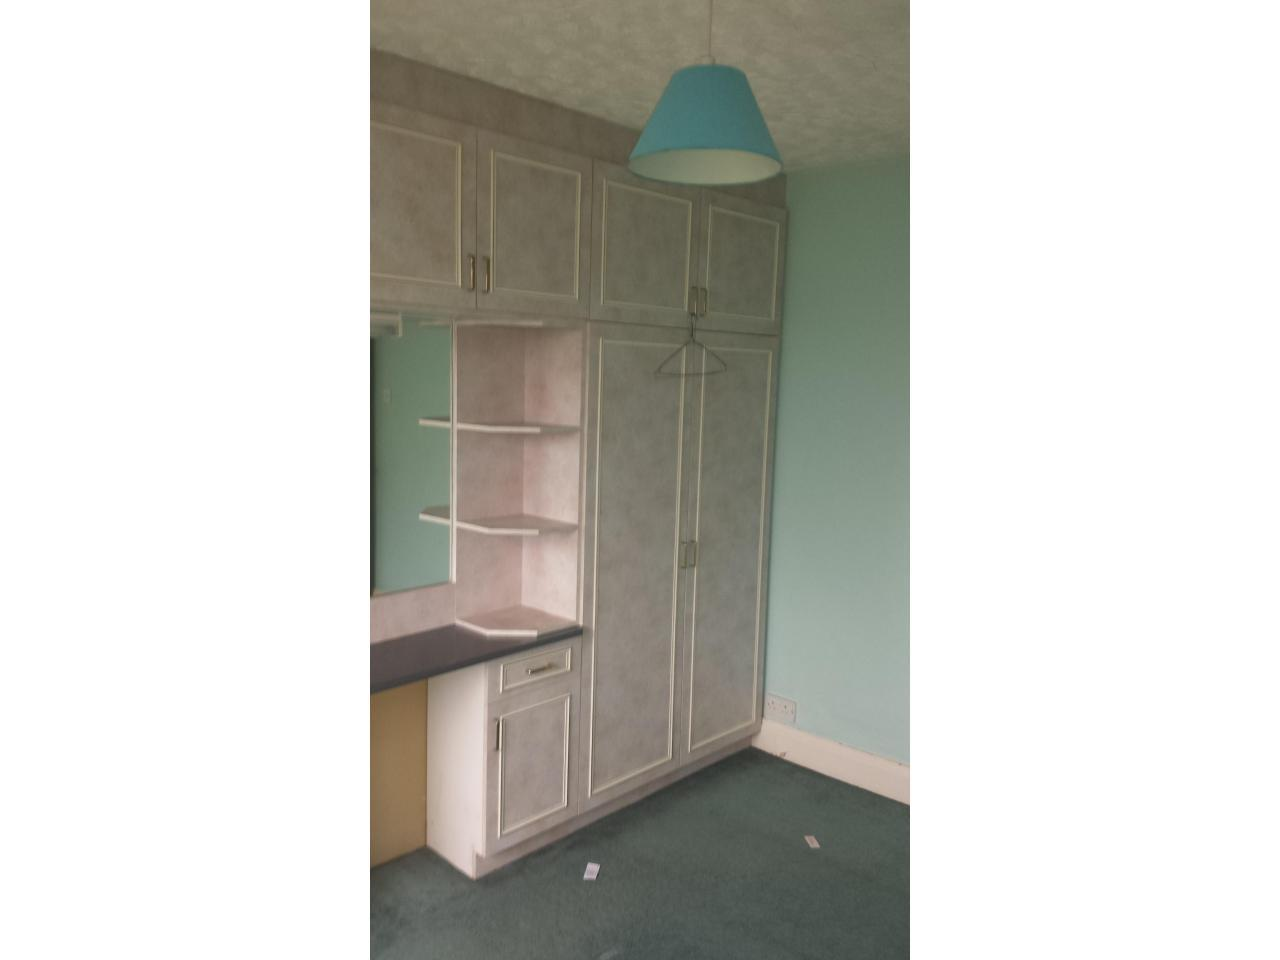 Сингл и Дабл комнаты в аренду на Neasden / Sudbury Hill / Harrow / Greenford. - 9